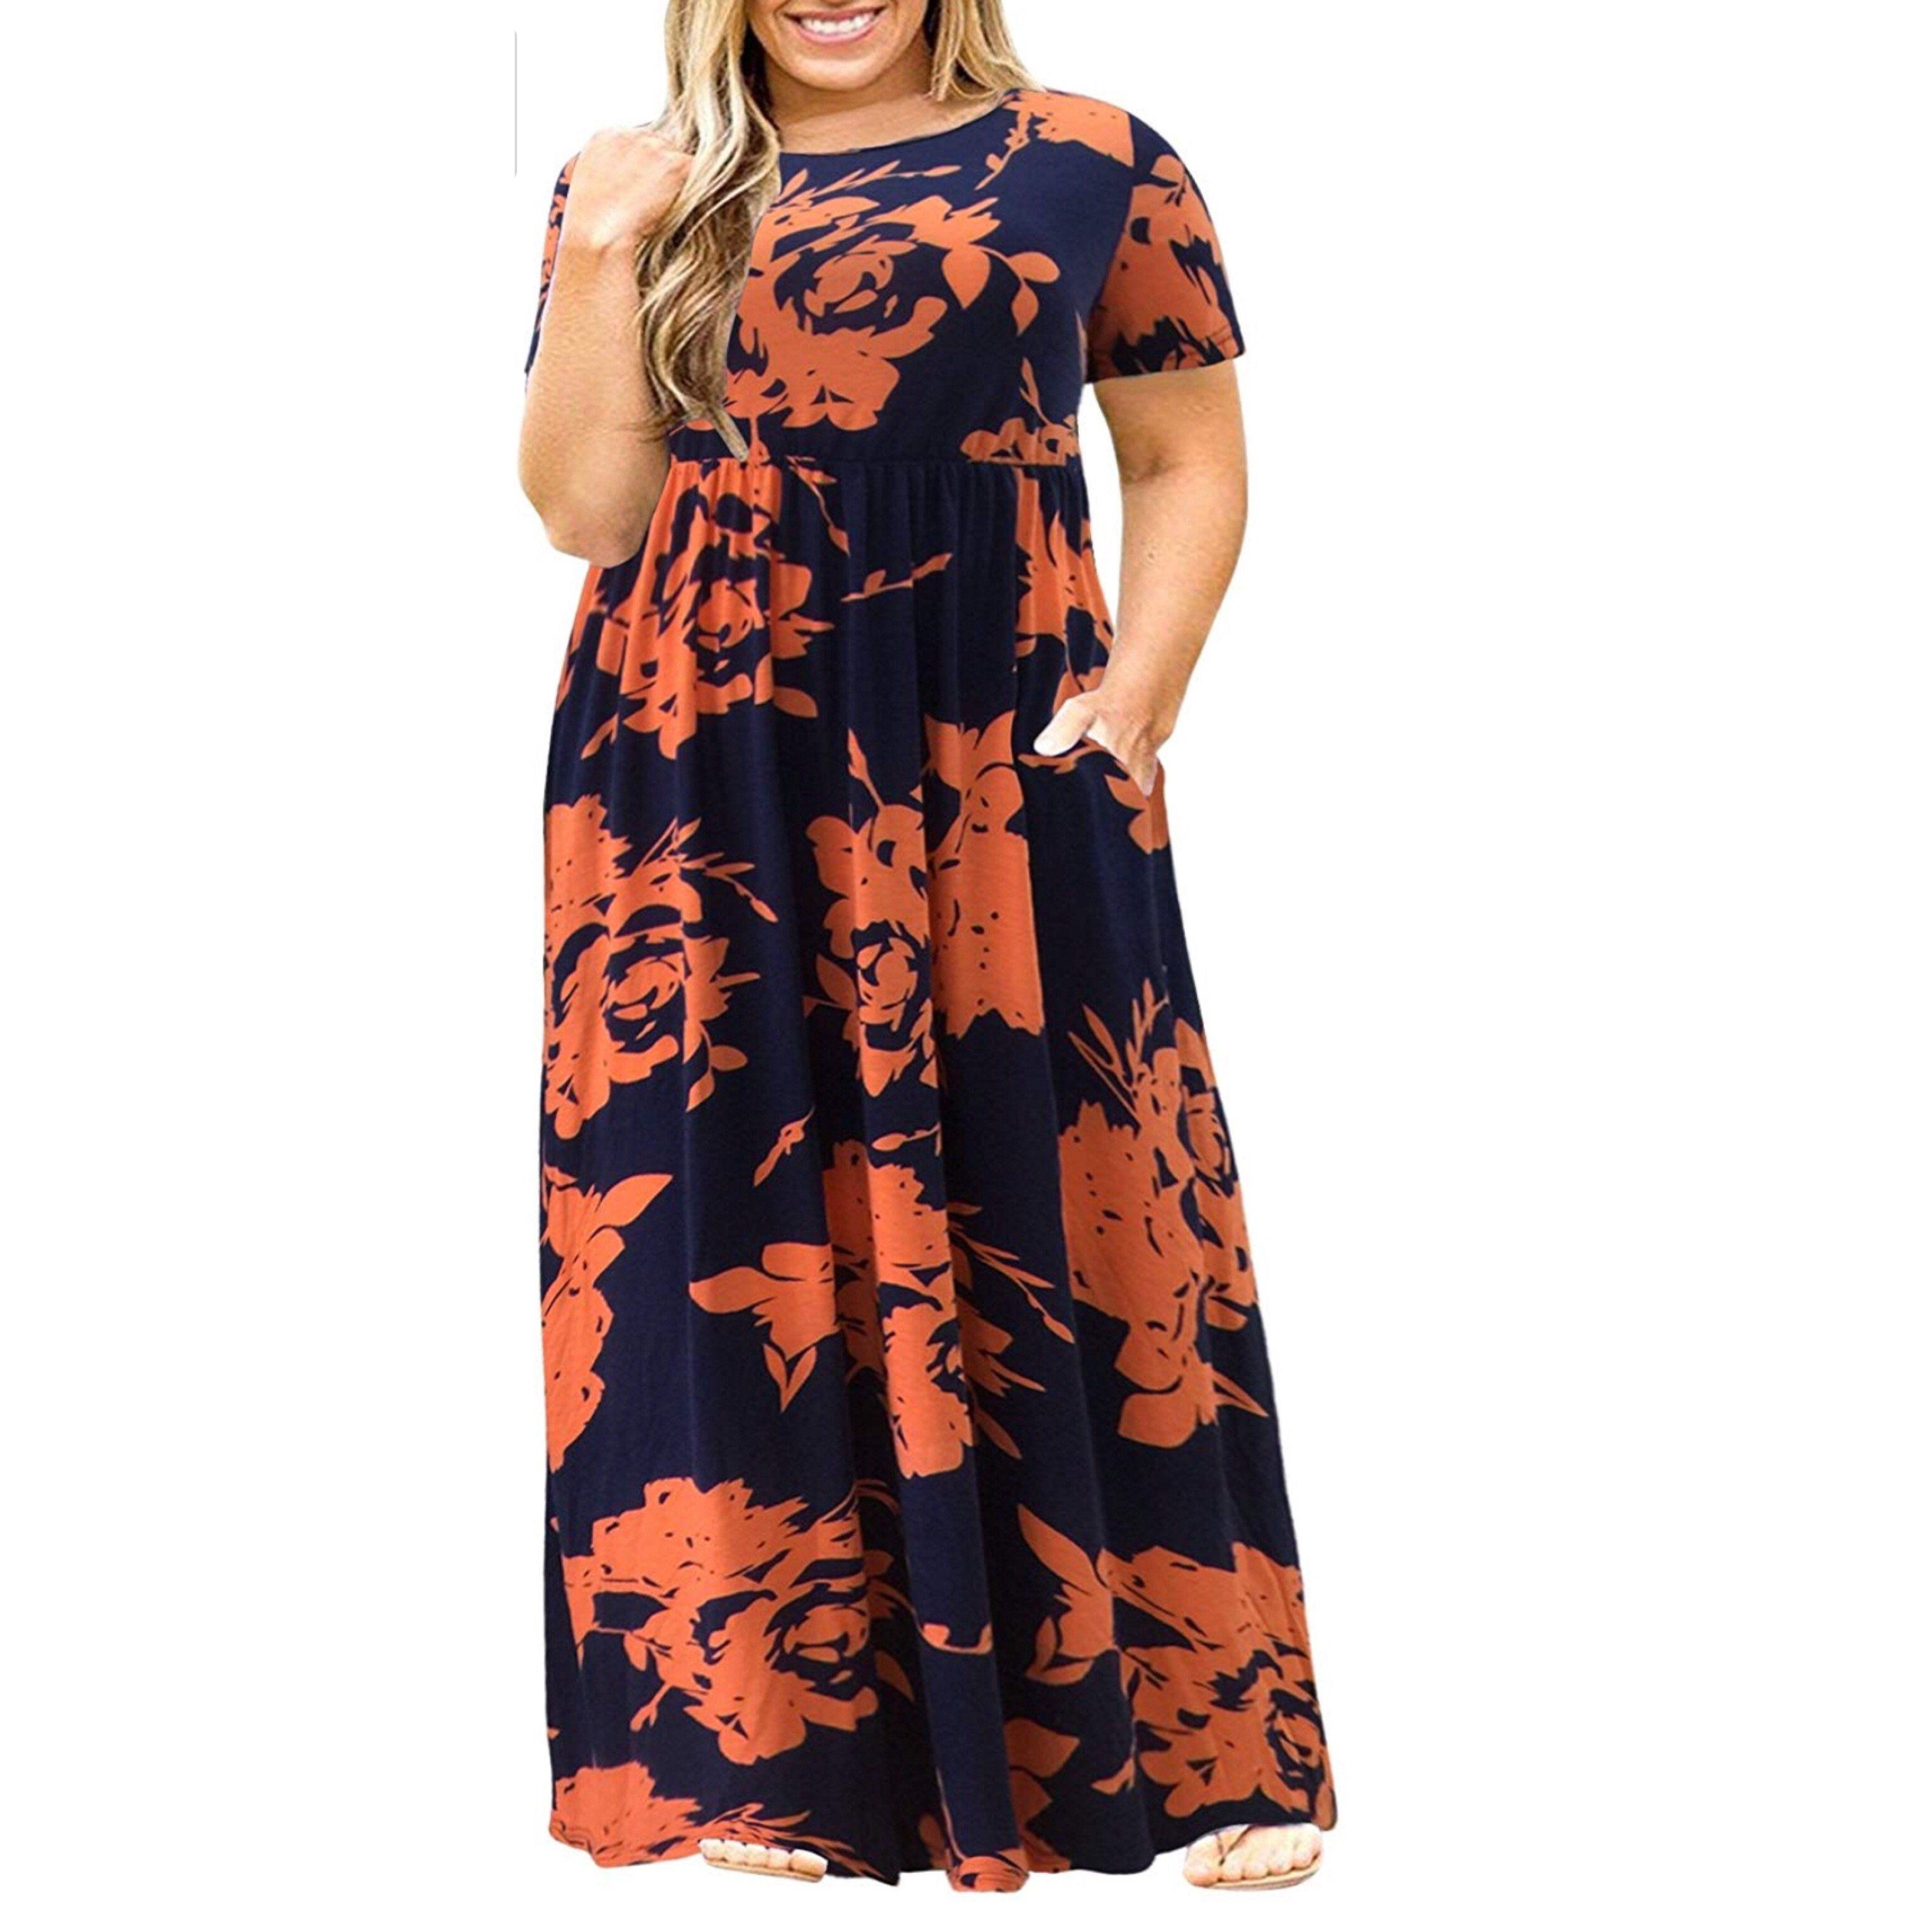 Casual Loose Plus Size Maxi Dress Us Sizes 14 Plus 26 Plus In 2021 Casual Dresses Plus Size Maxi Dress Plus Size Maxi Dresses [ 3072 x 3072 Pixel ]